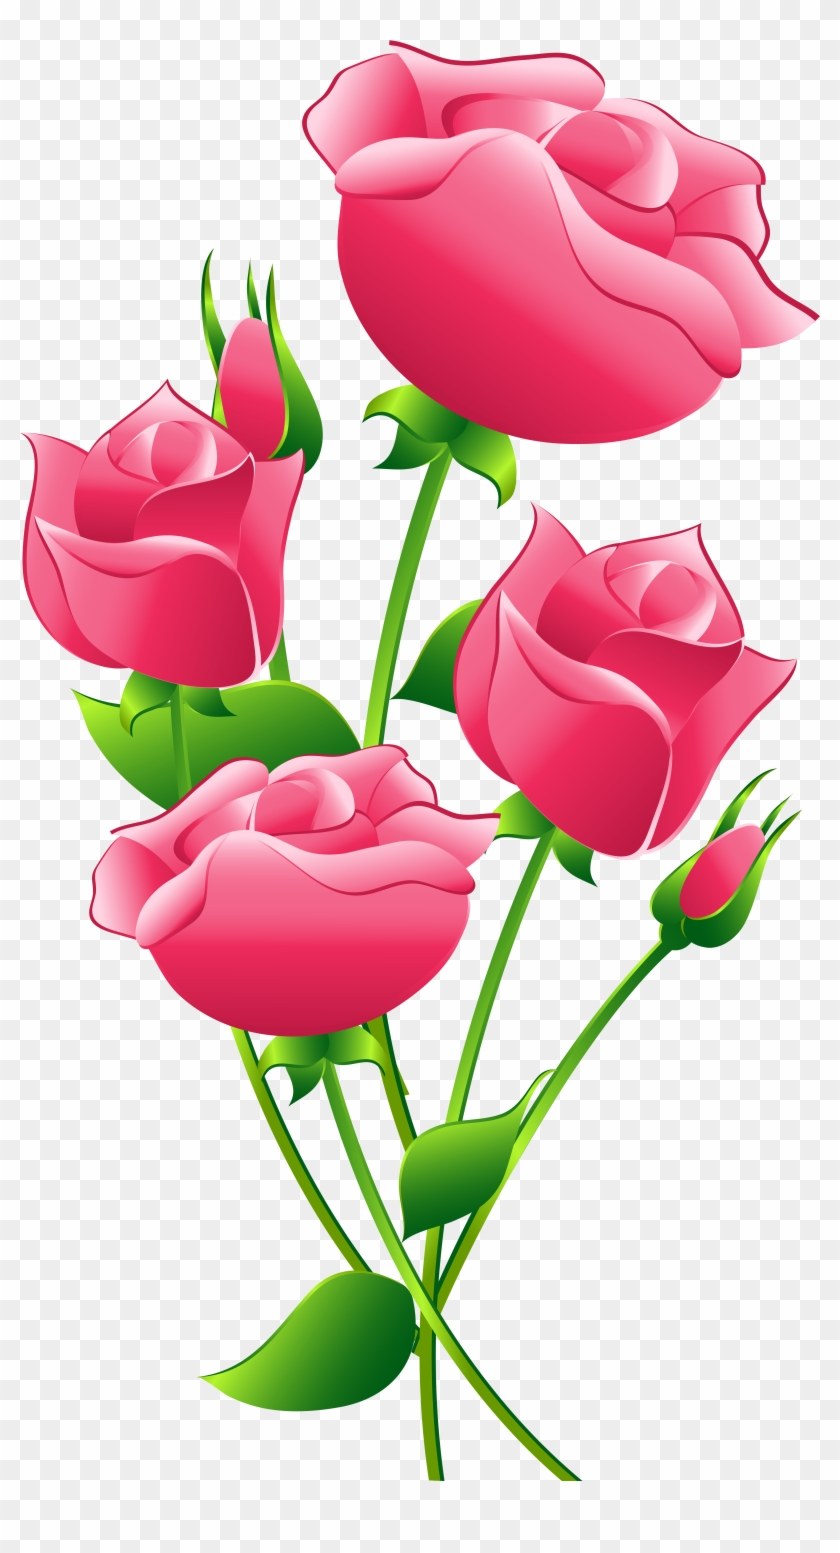 Pink Roses Transparent Clip Art Image - Pink Roses Transparent Clip Art Image #14289